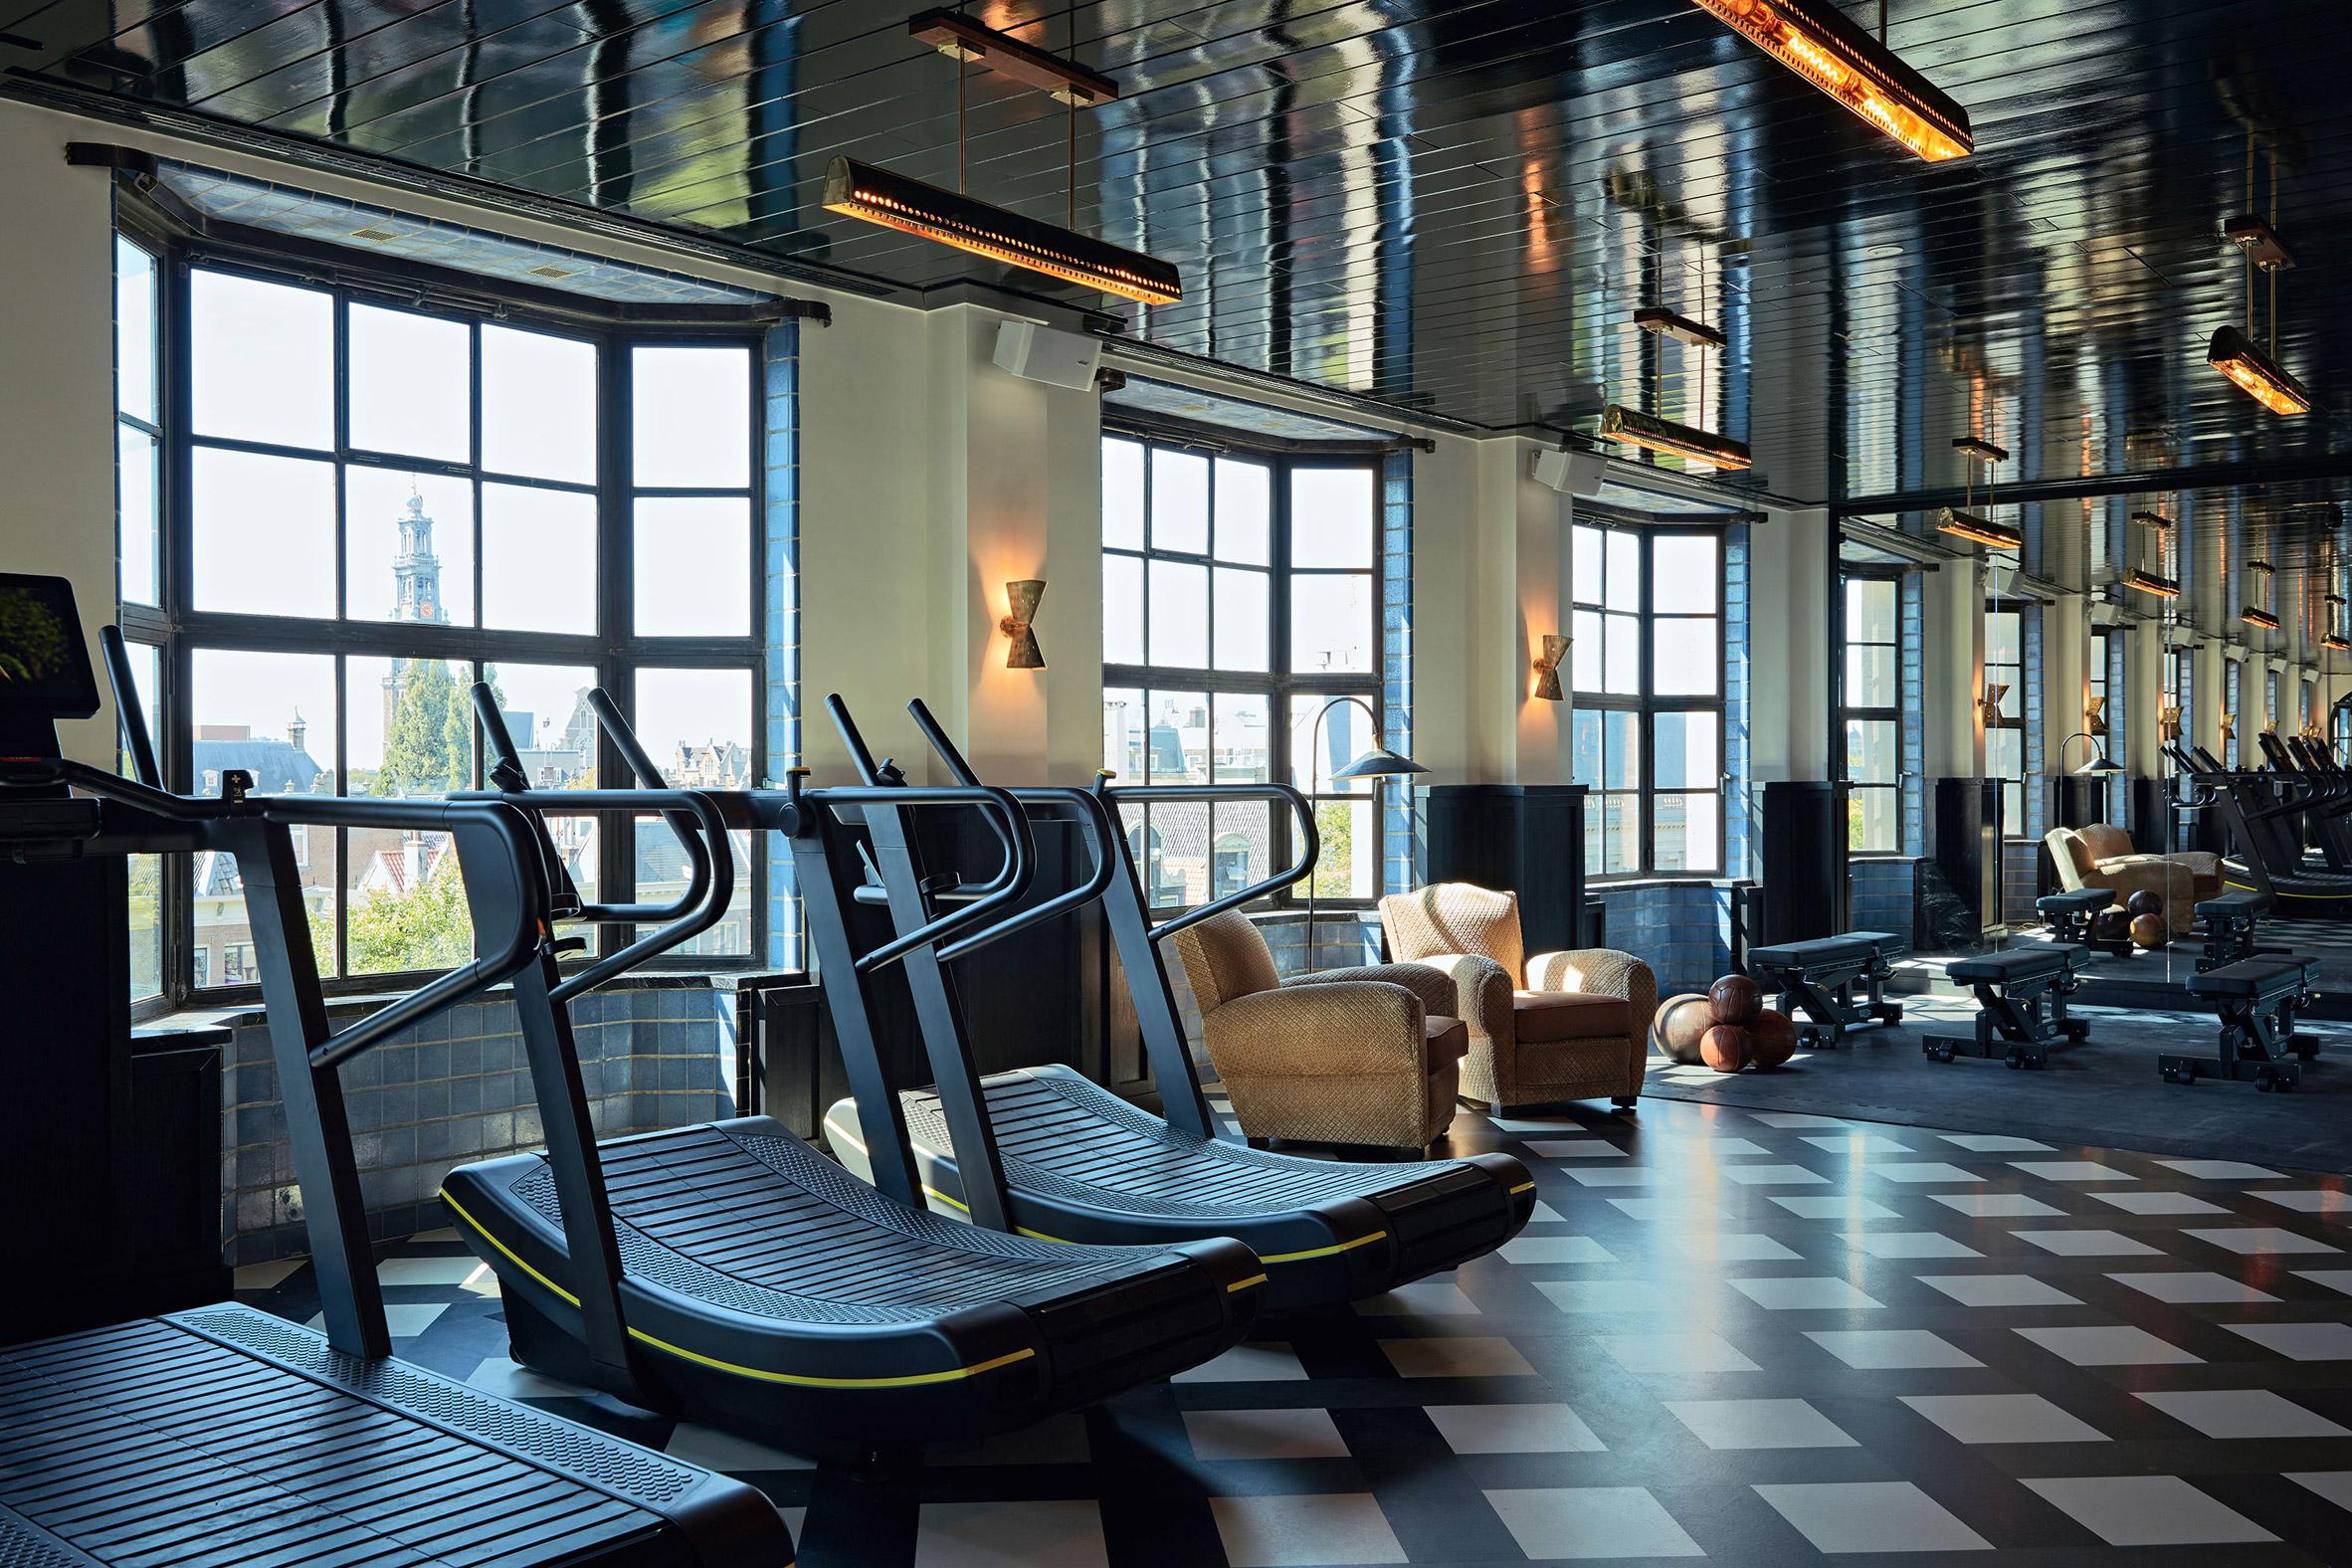 soho-house-amsterdam-interiors-_dezeen_2364_col_20.jpg